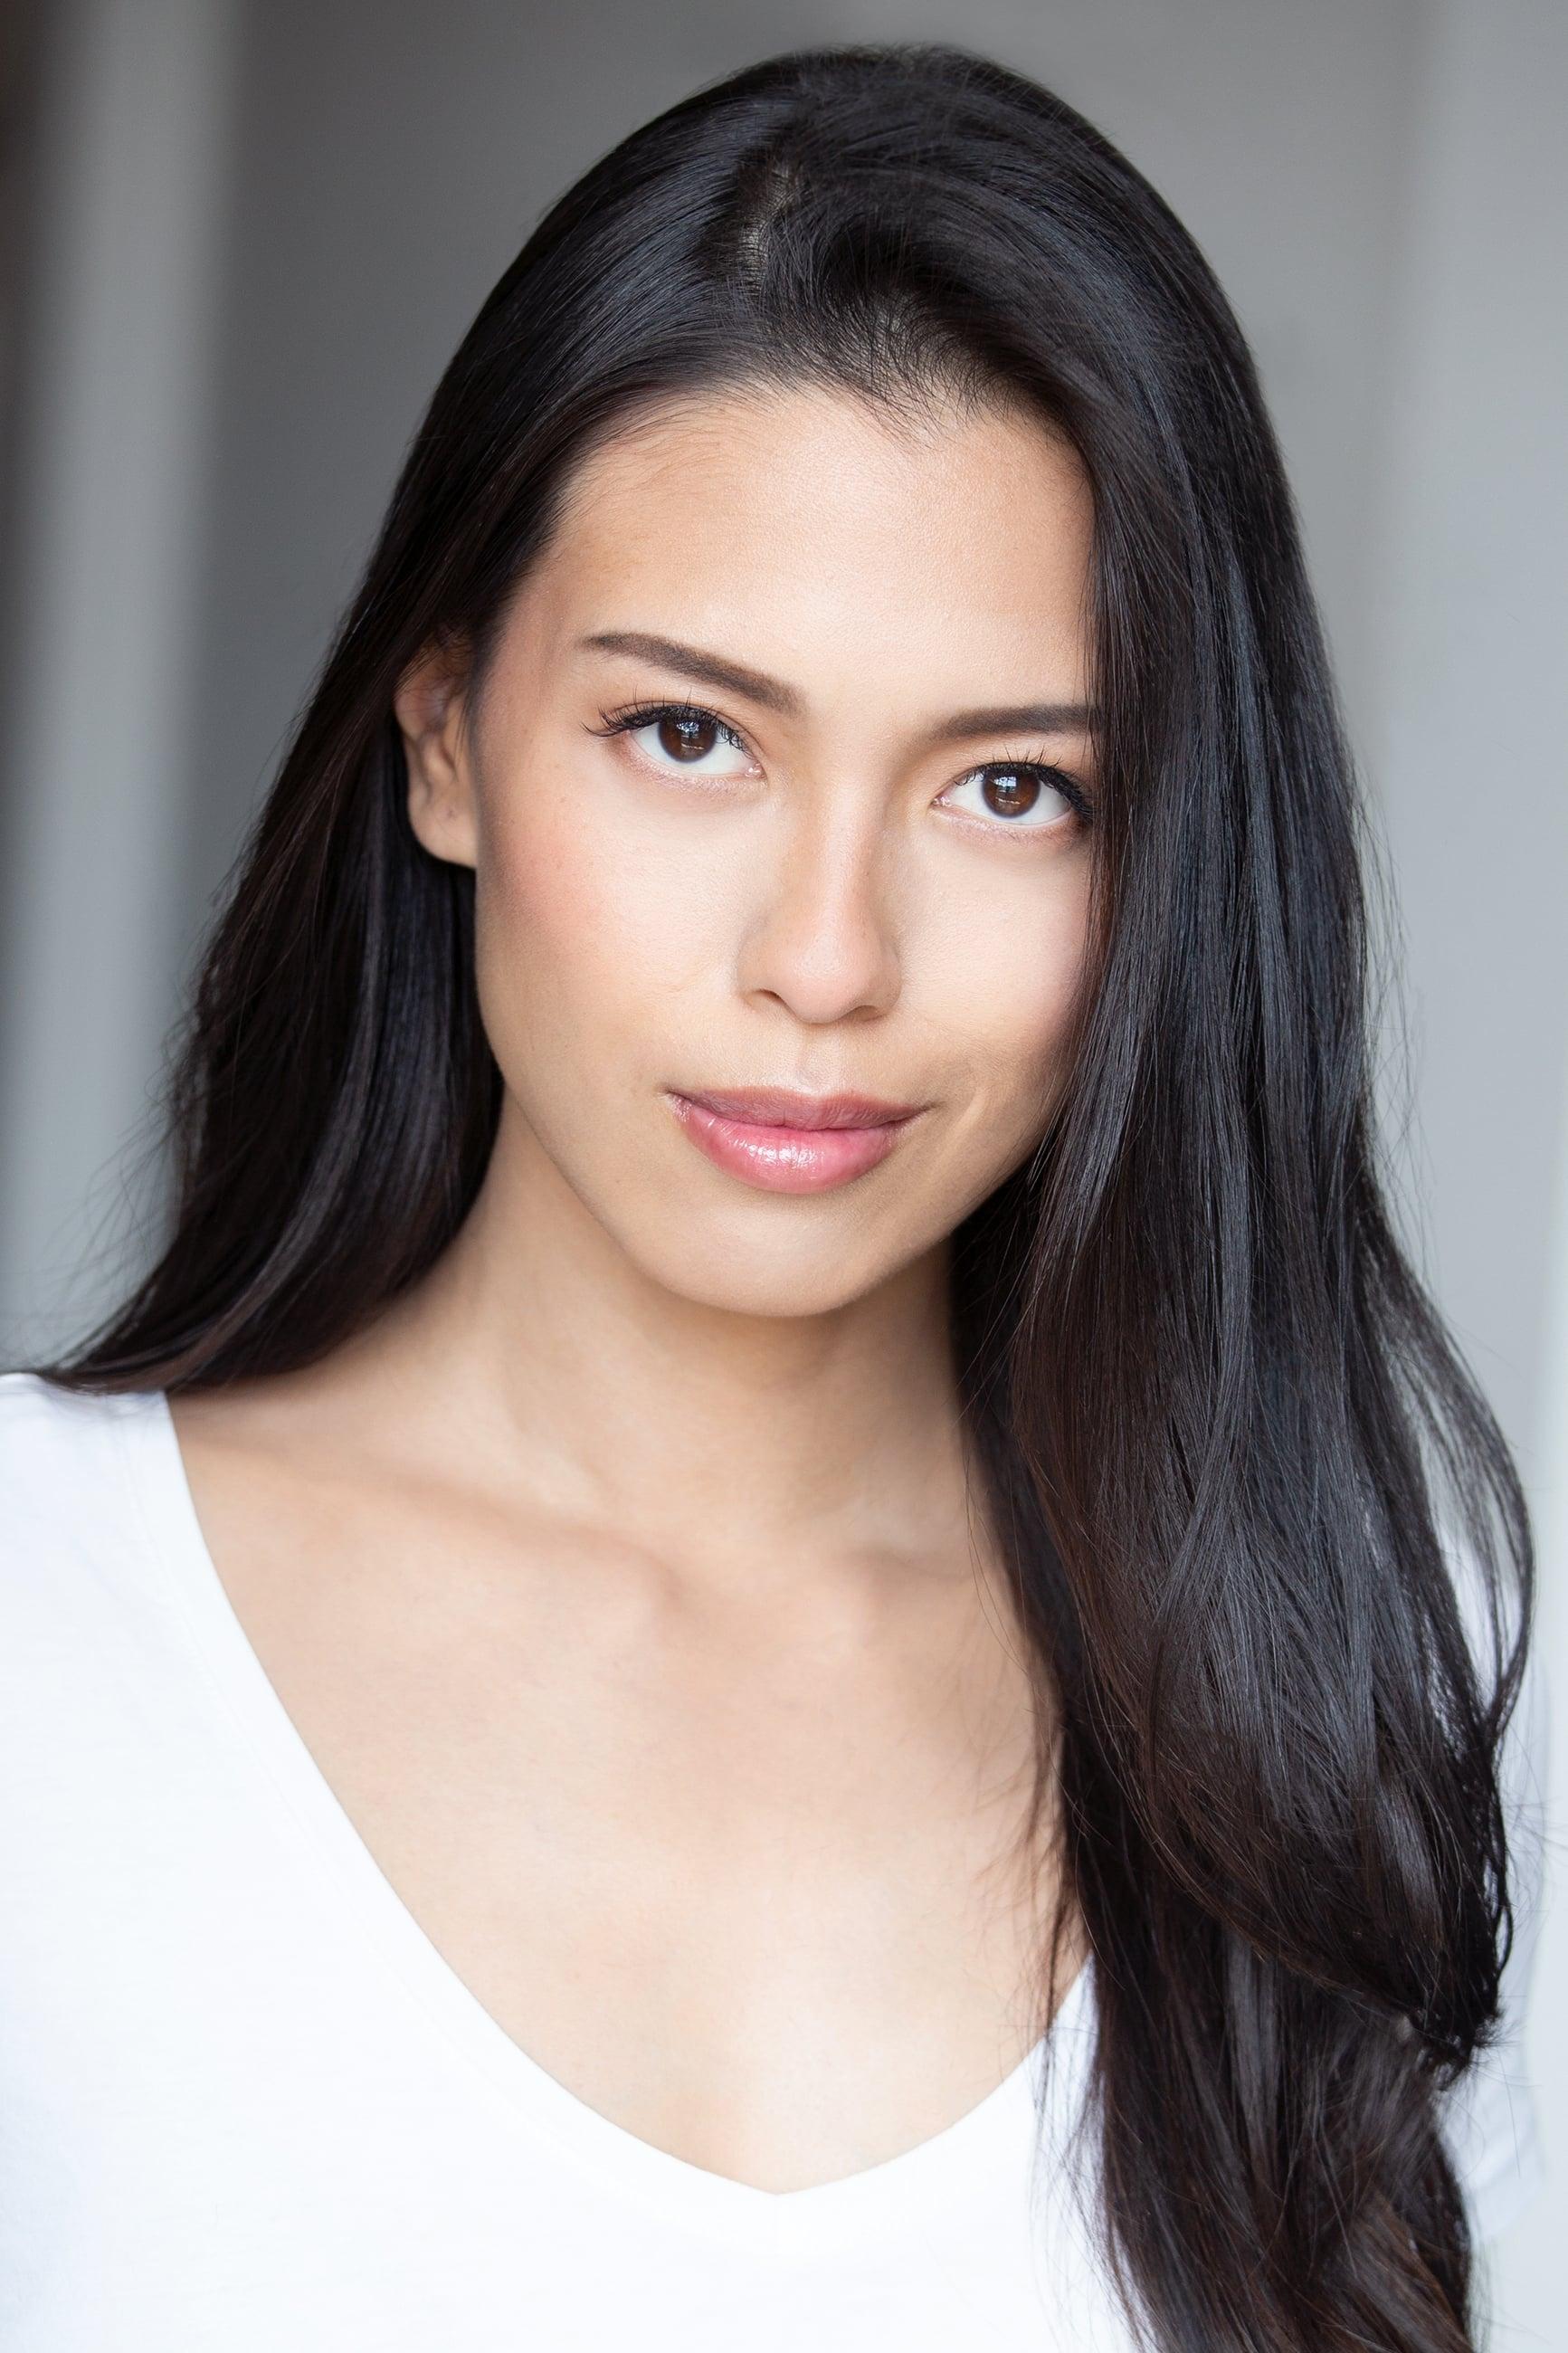 Christine L. Nguyen